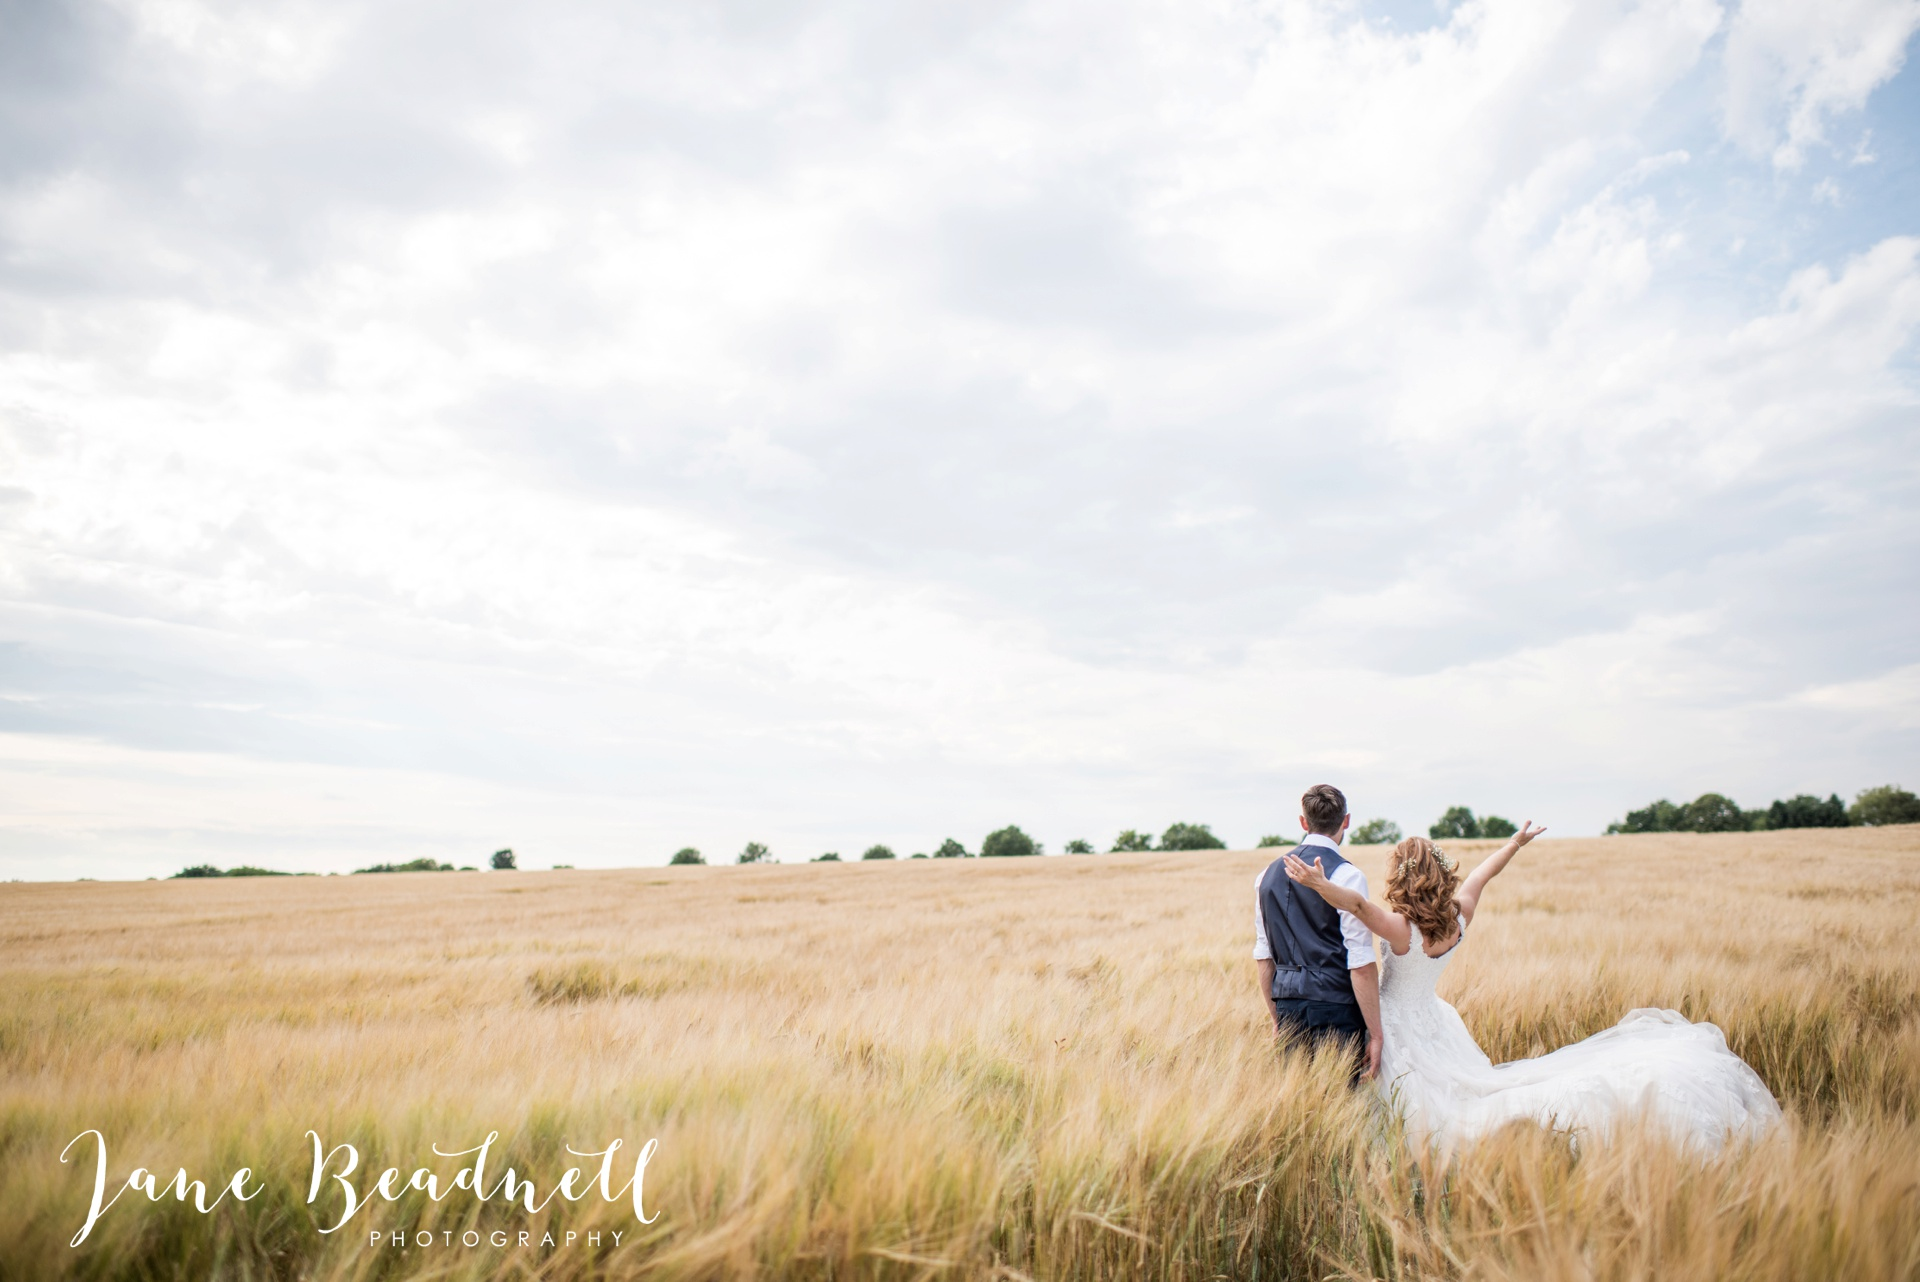 yorkshire-fine-art-wedding-photographer-jane-beadnell-photography-poppleton-york_0133